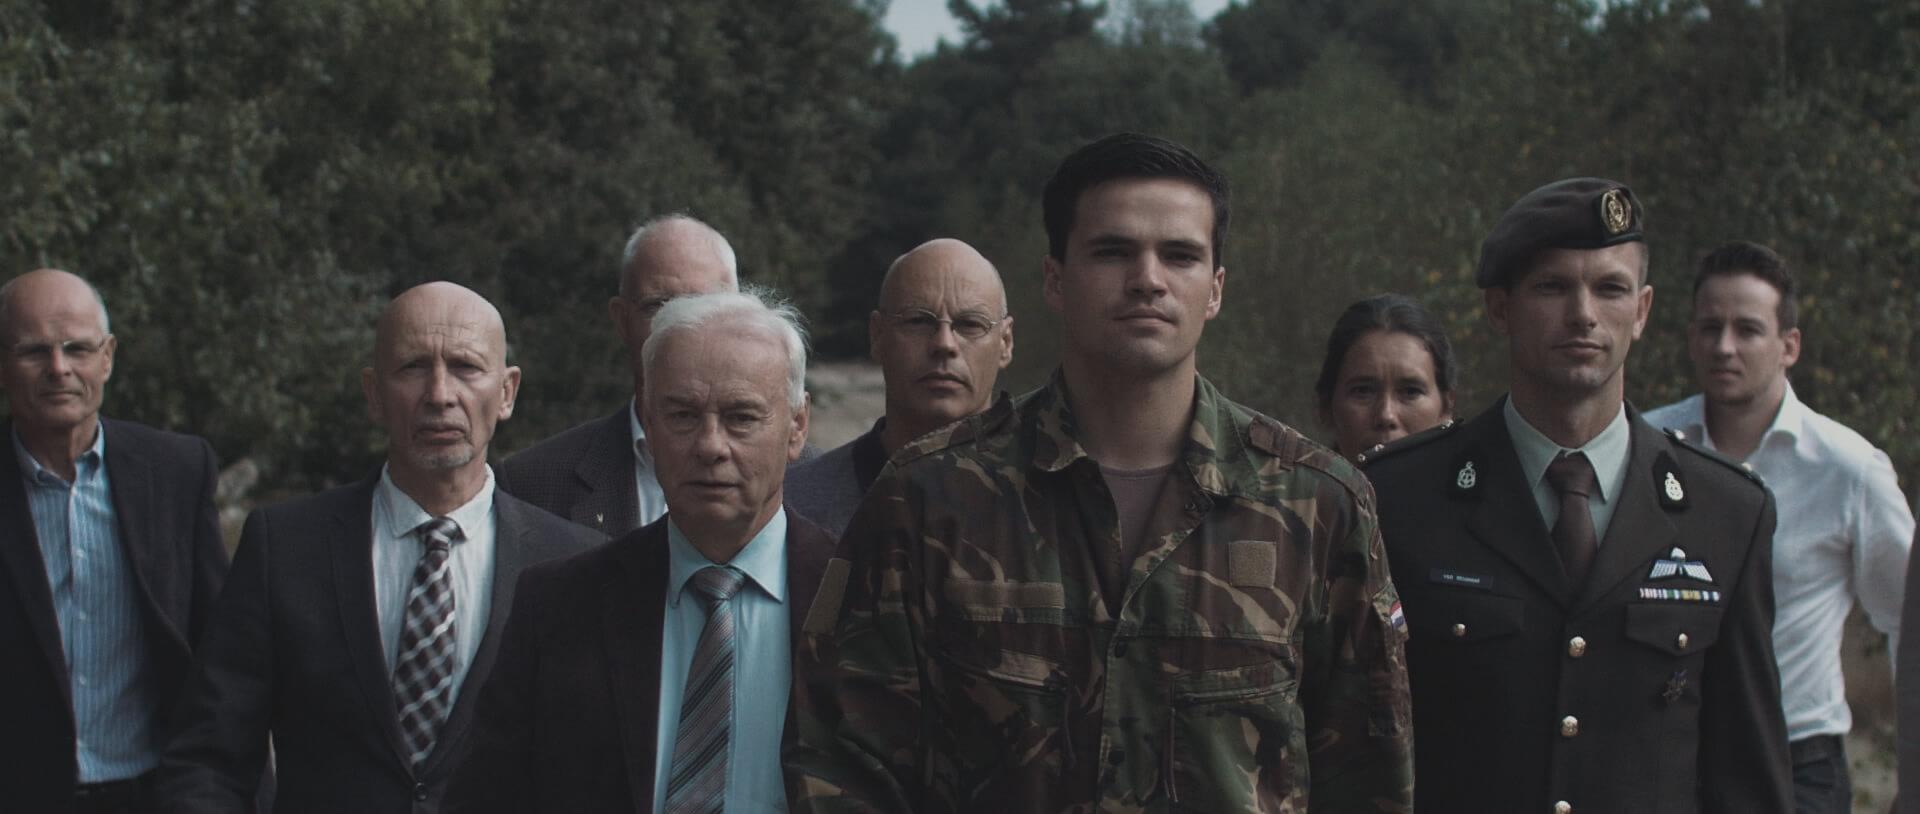 nederlandse-officieren-vereniging